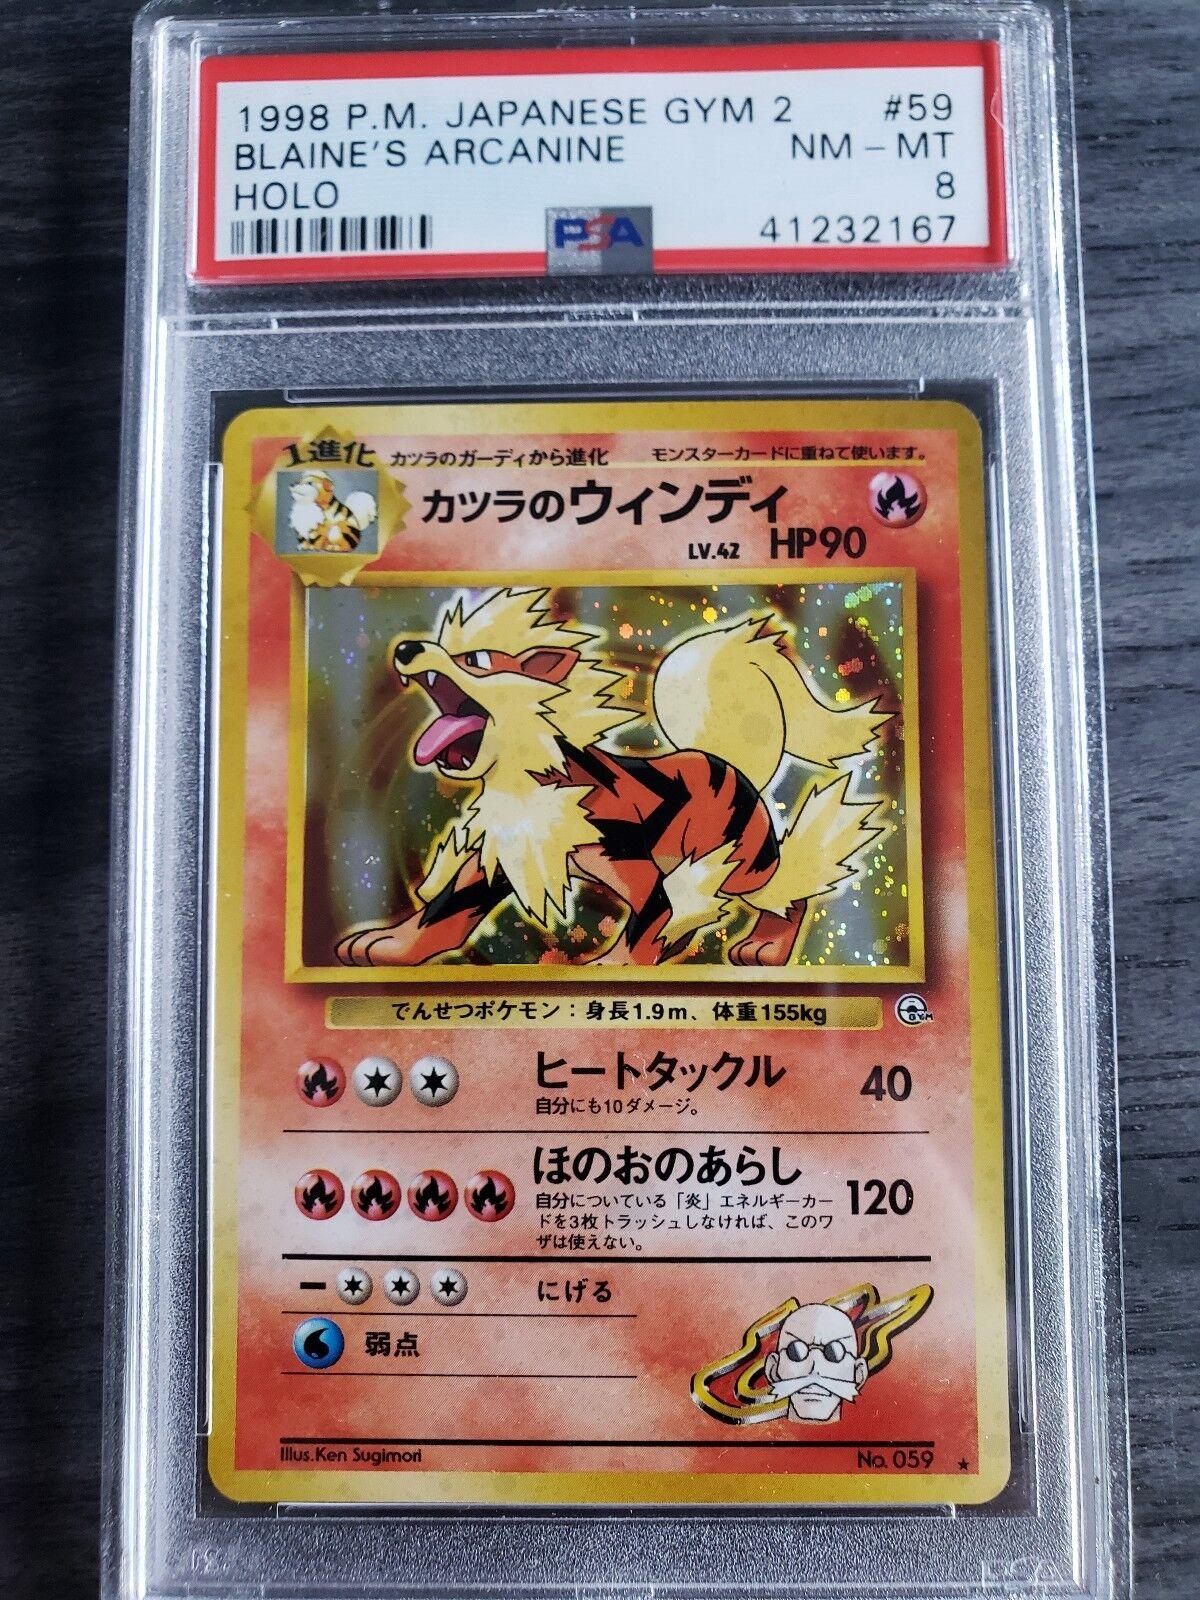 1999 pokemon japanischen psa in mint - arcanine blaine.